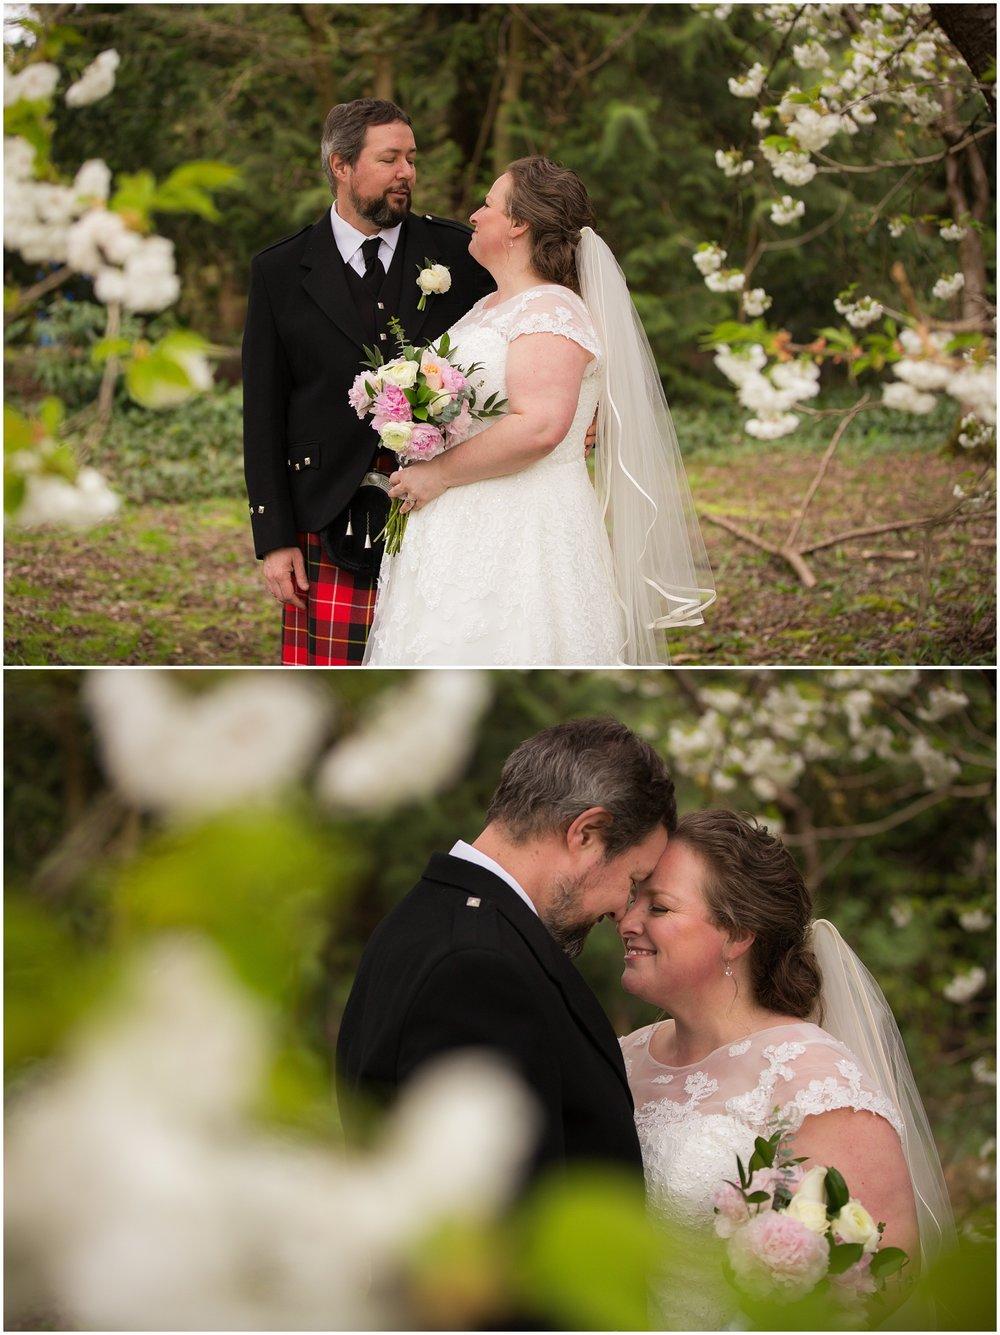 Amazing Day Photography - Hart House Wedding - Deer Lake Park Wedding - Burnaby Wedding Photographer (7).jpg